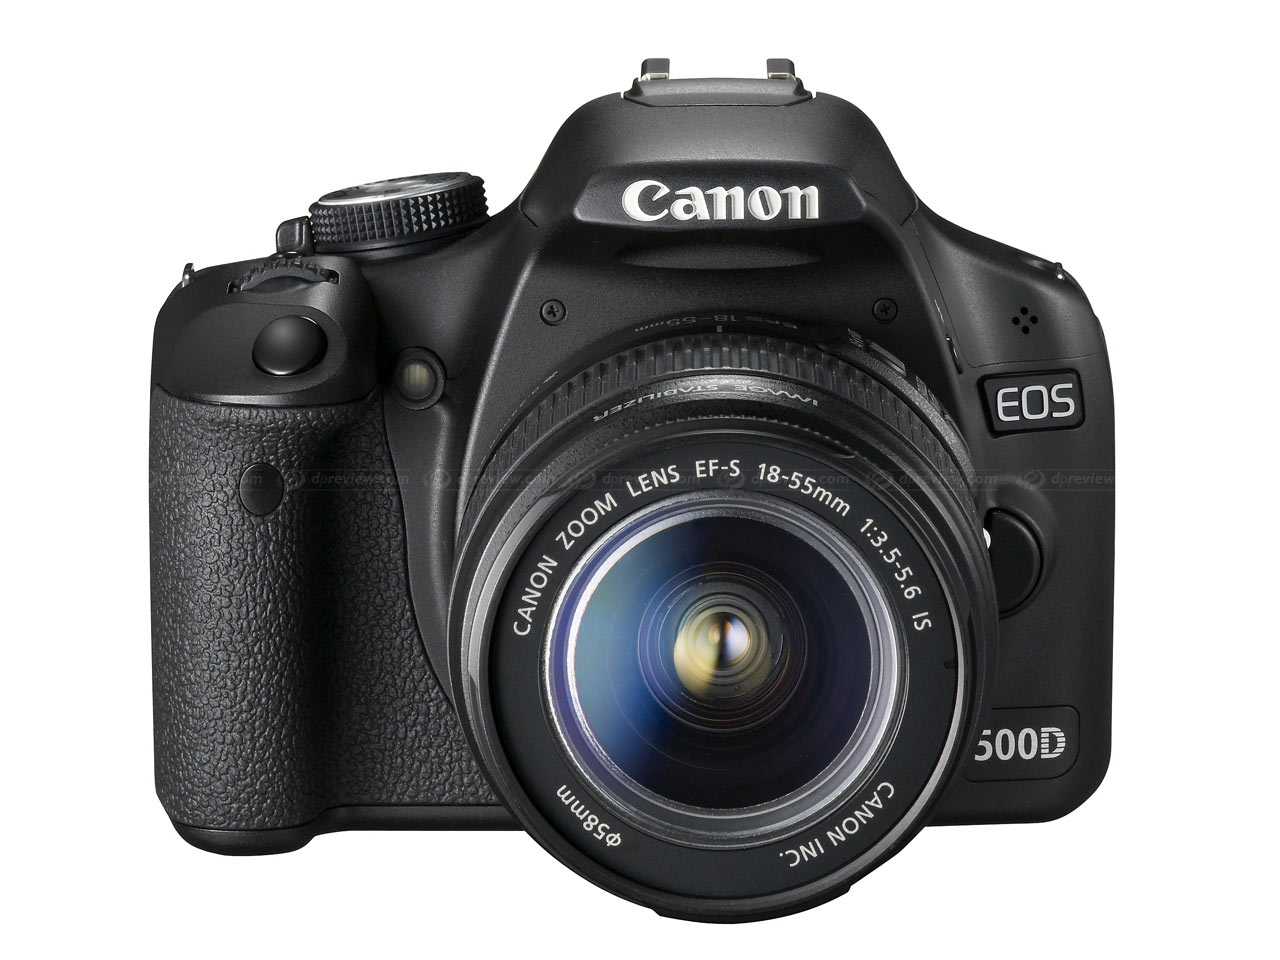 Daftar Harga Kamera DSLR Canon Lengkap 2016